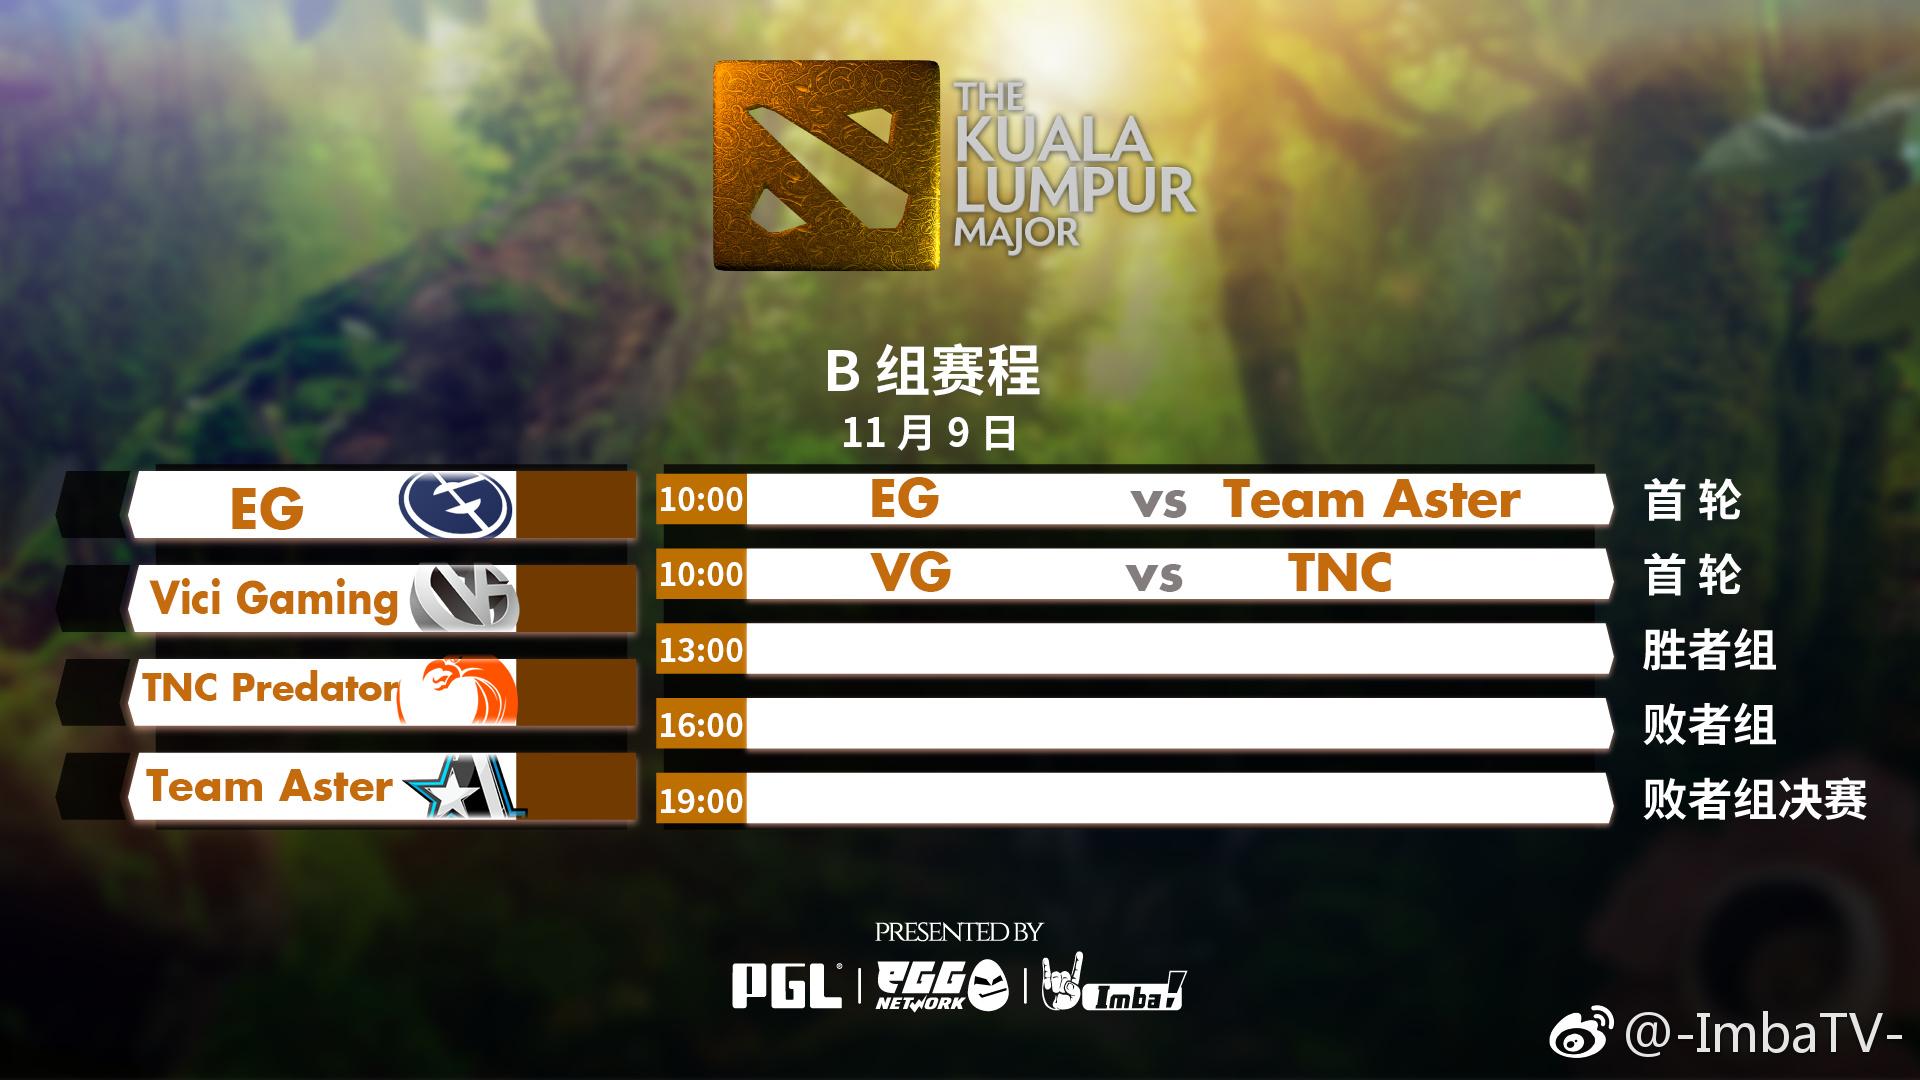 《DOTA2》吉隆坡Major分组和赛程公布 首日VG对阵TNC